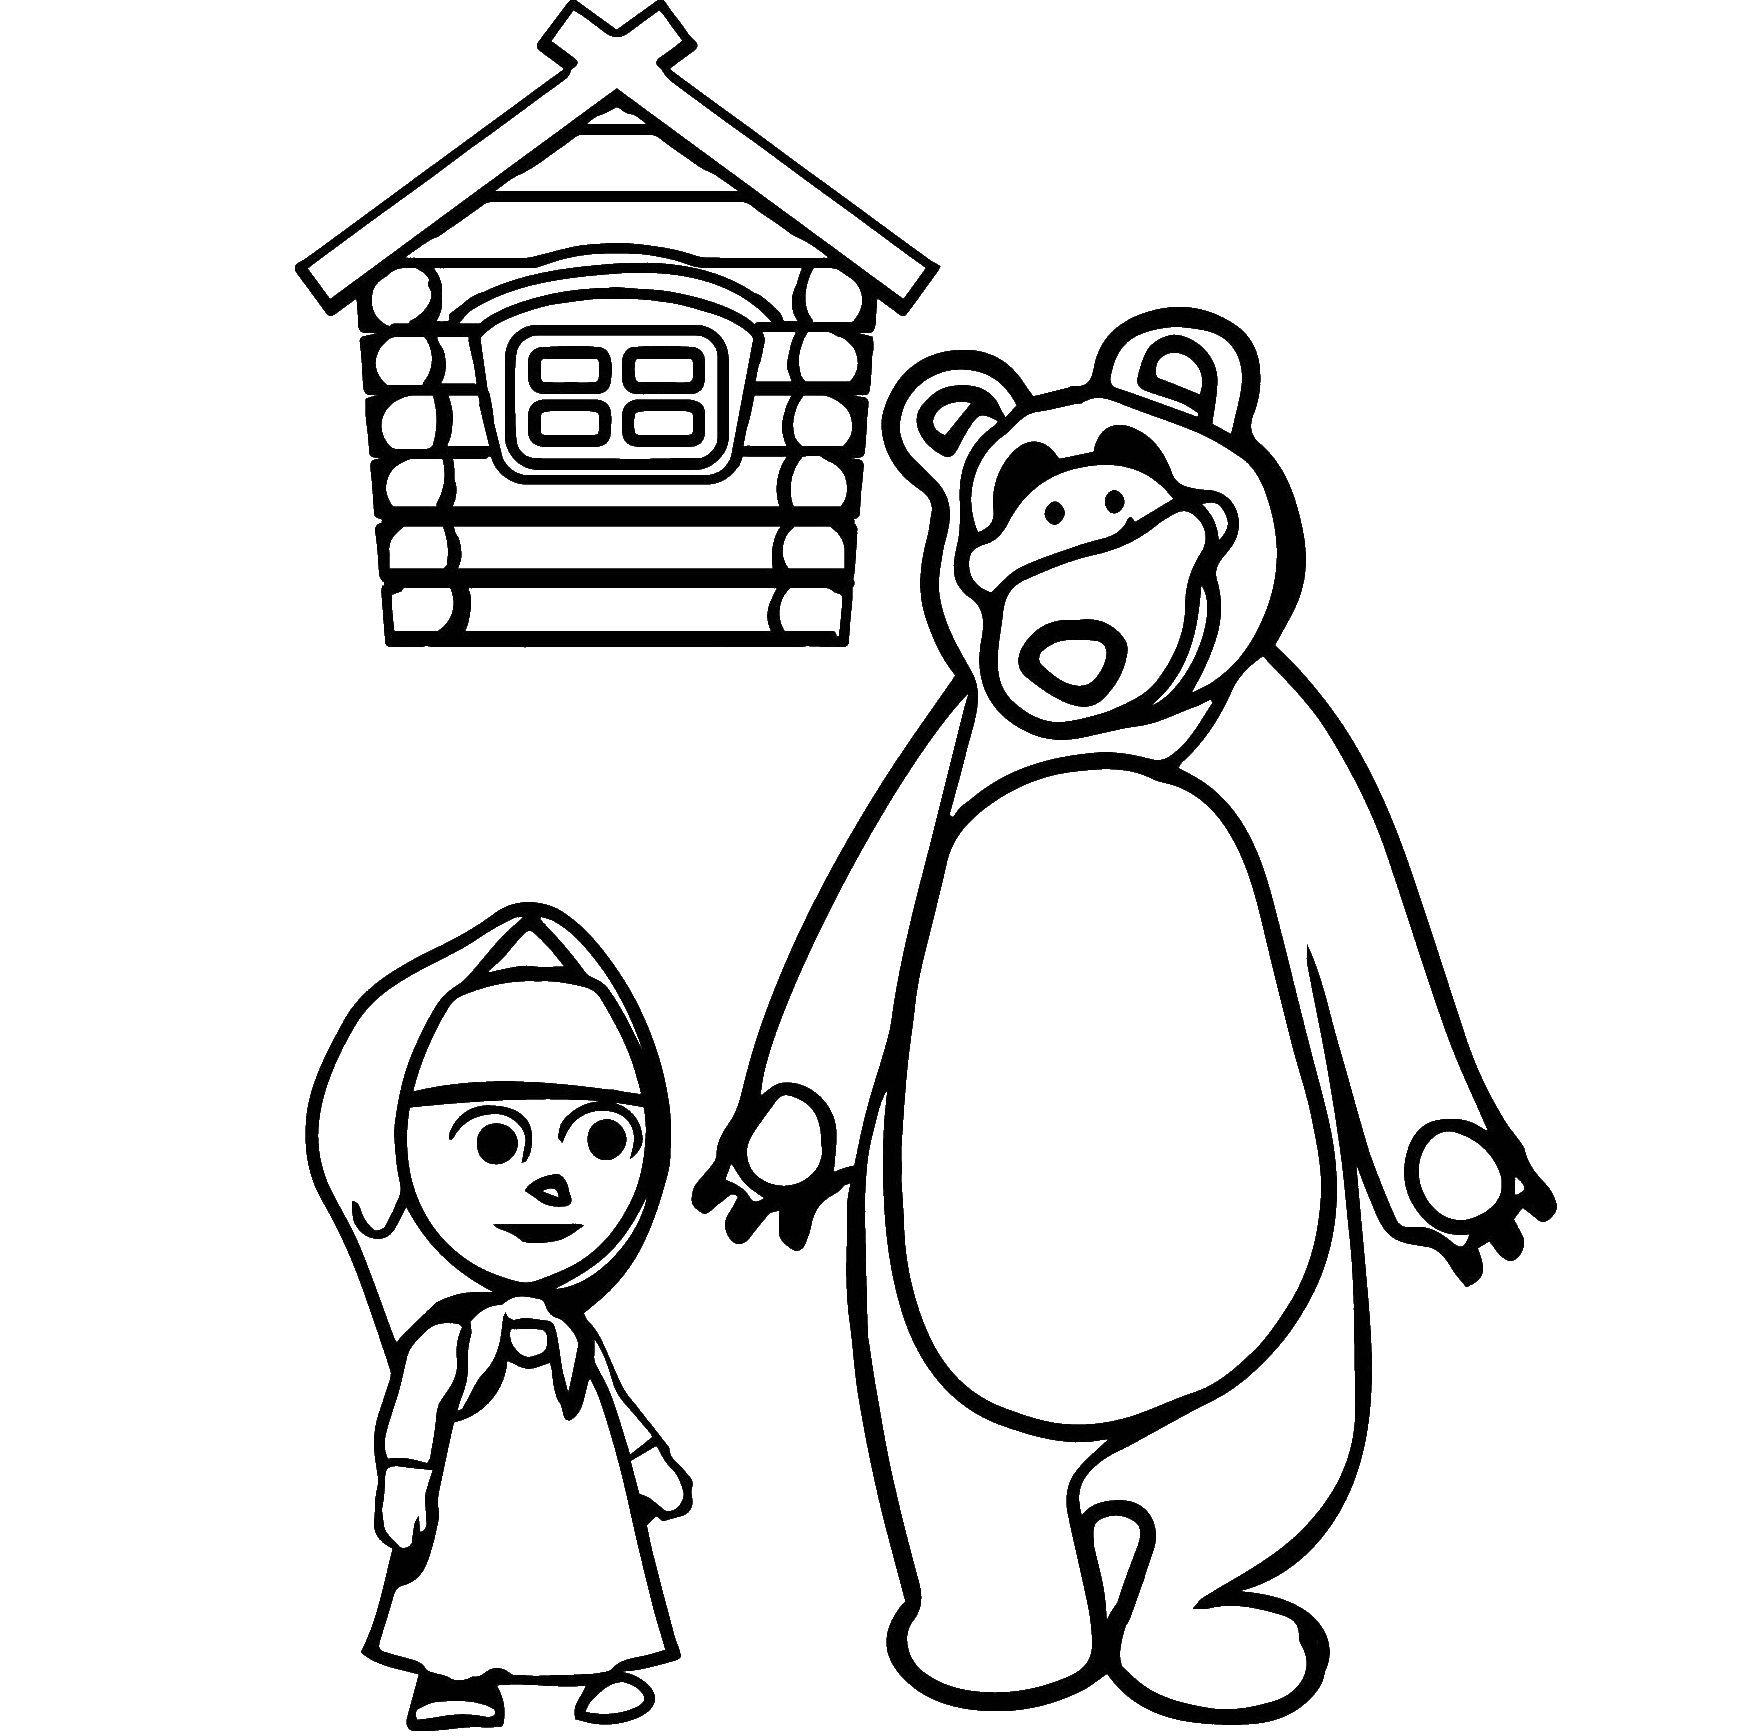 Раскраска дом медведя из мультика Маша и Медведь на vipraskraski.ru